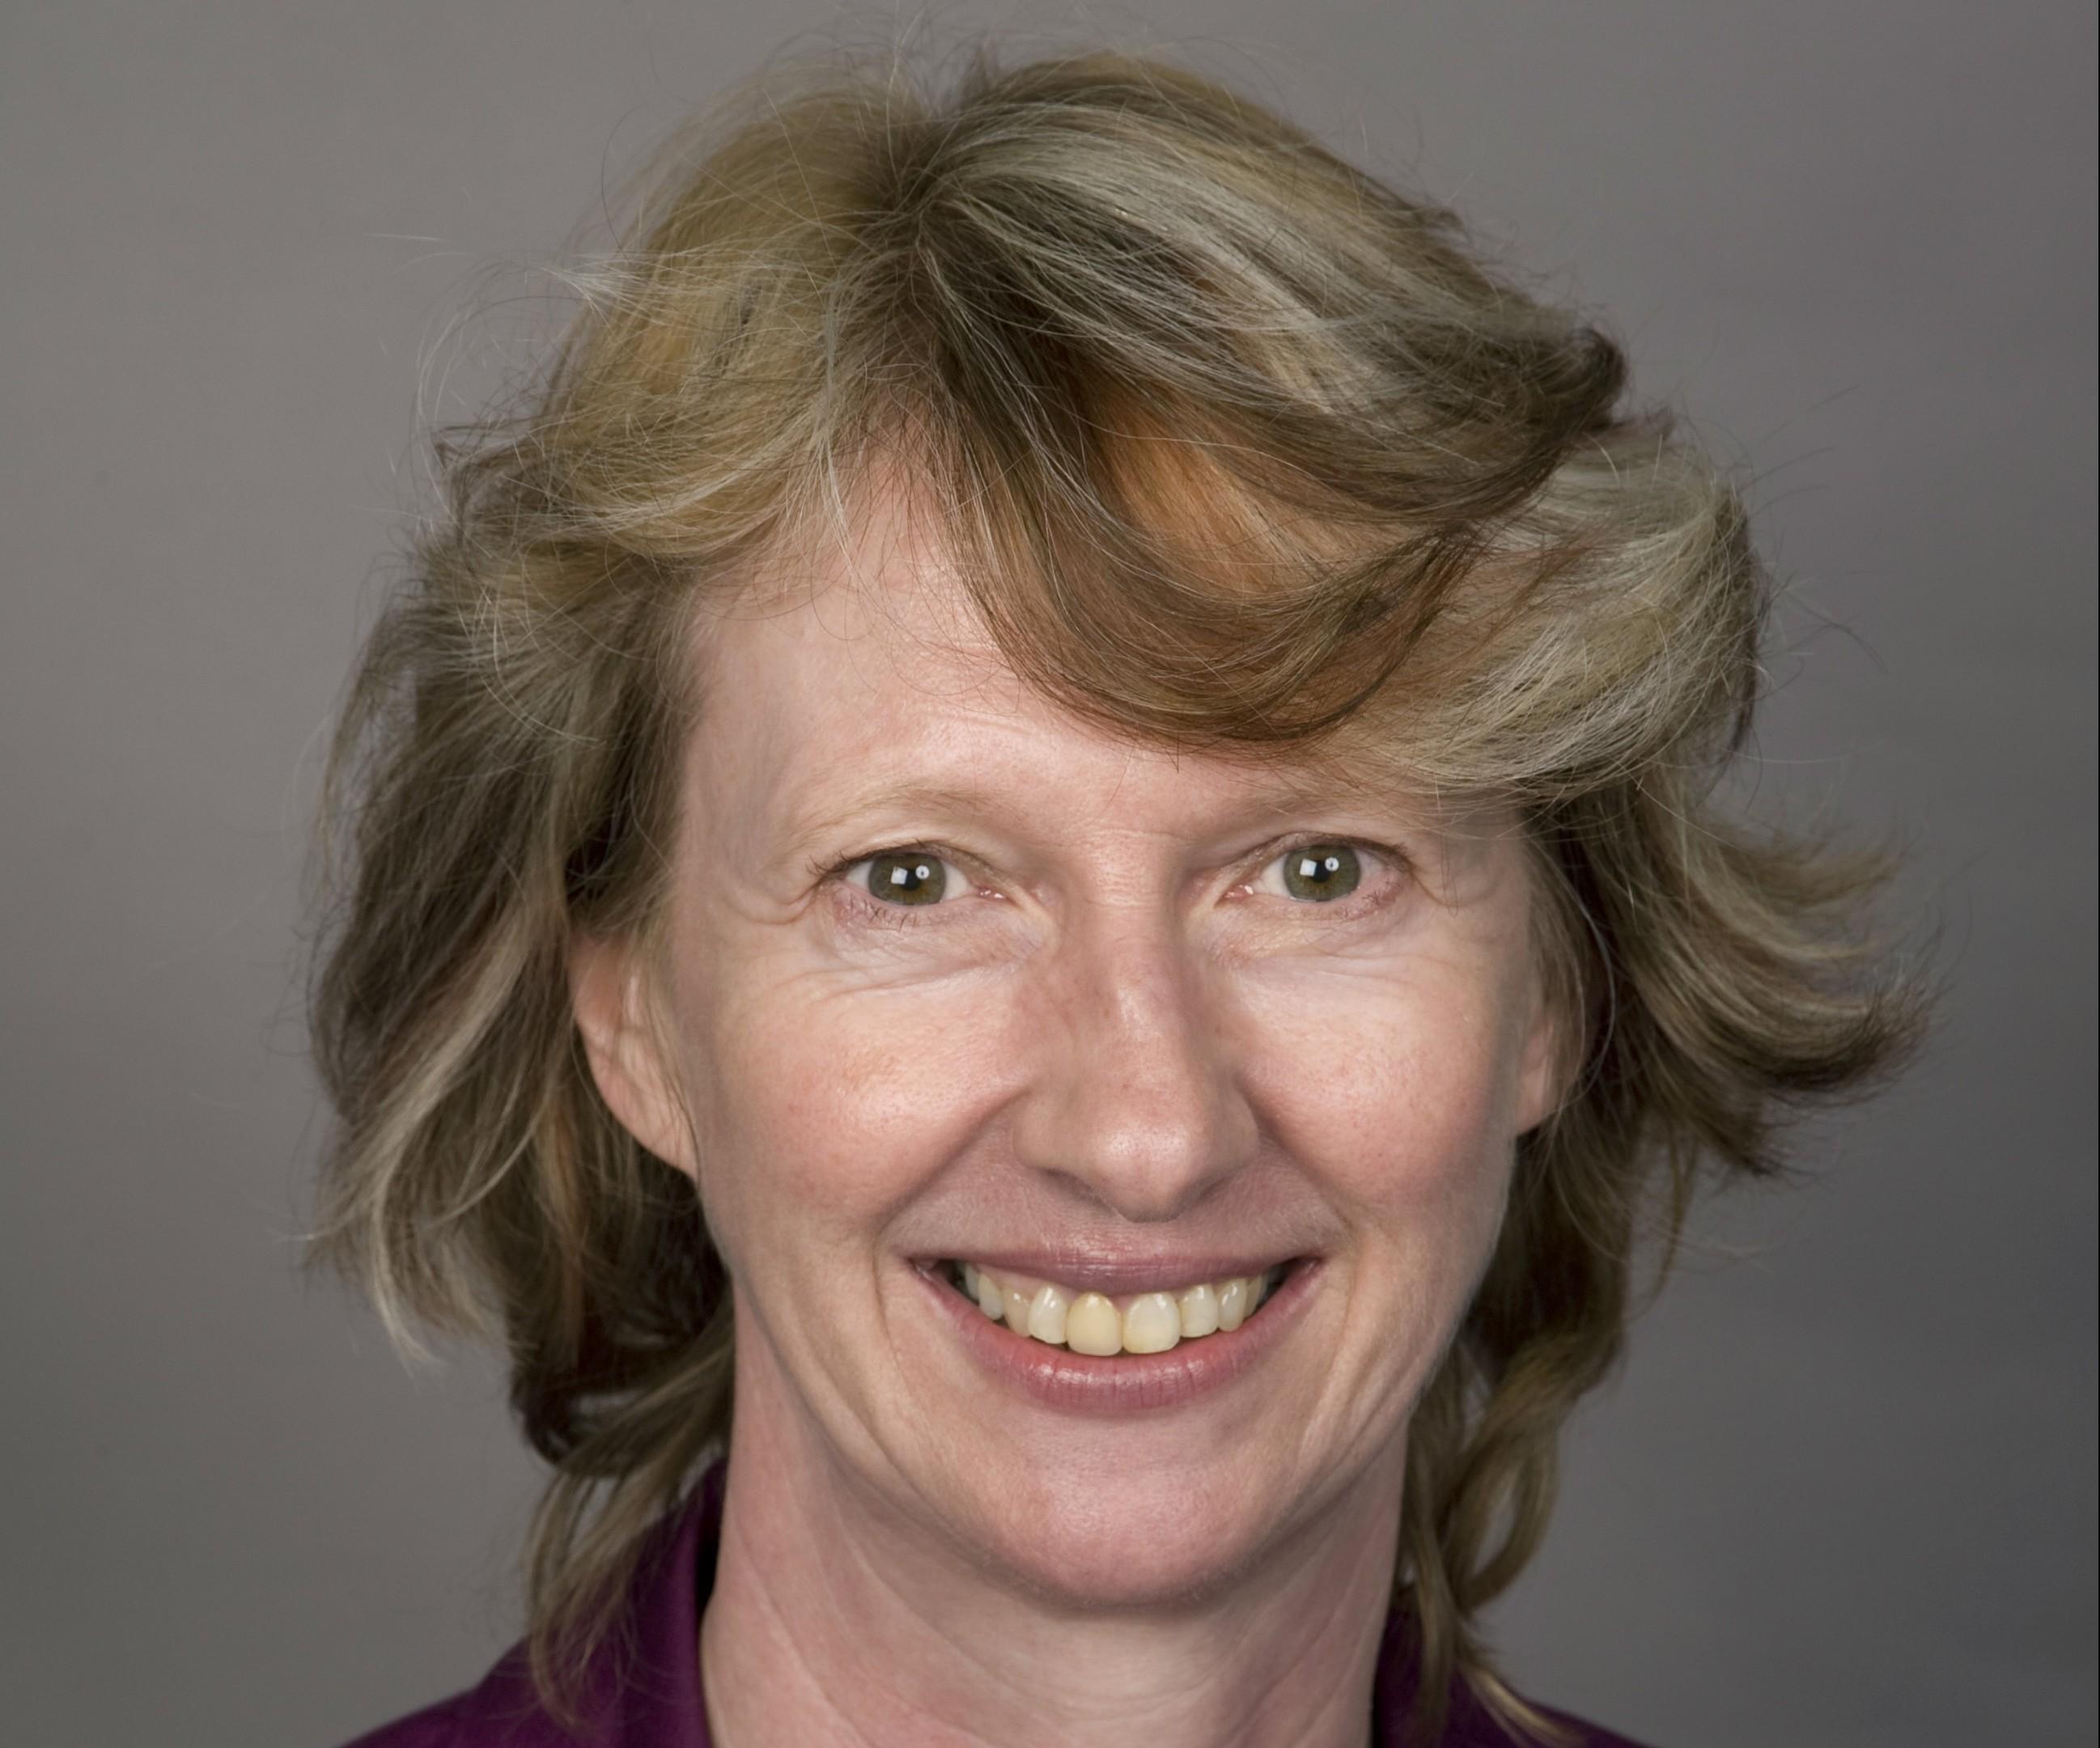 Councillor Karen Clark